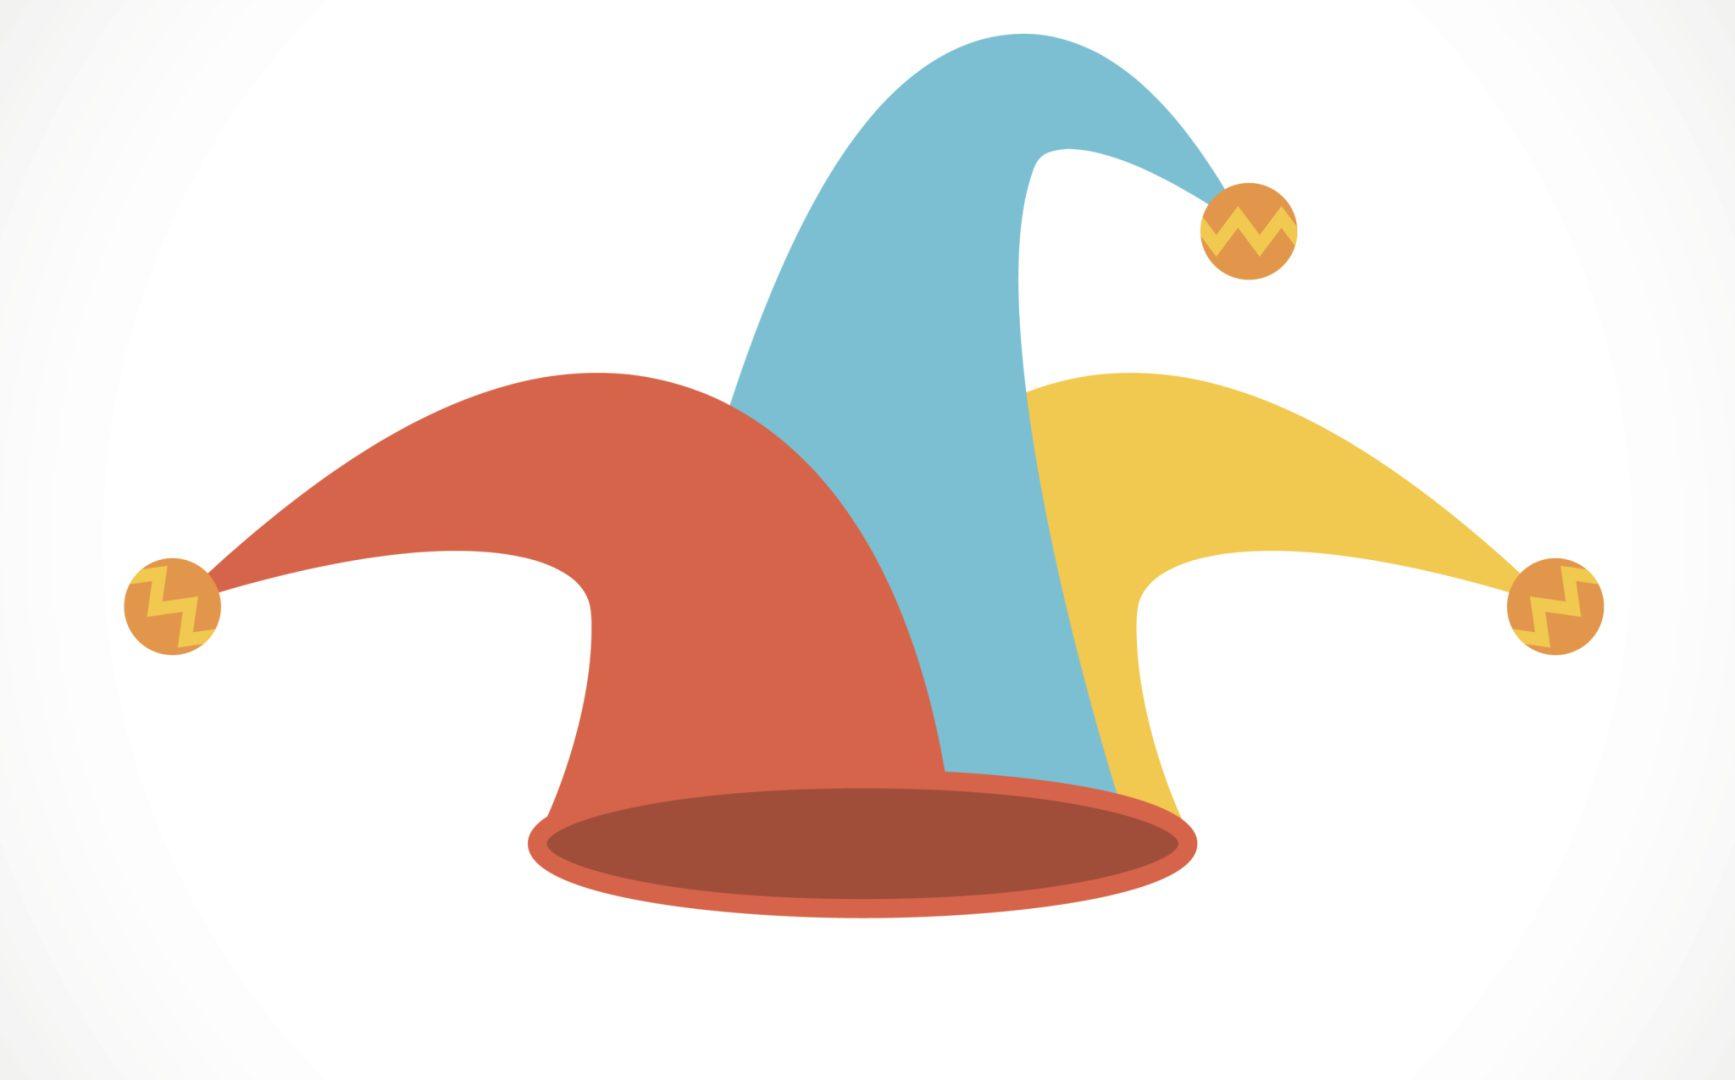 Jester hat flat icon